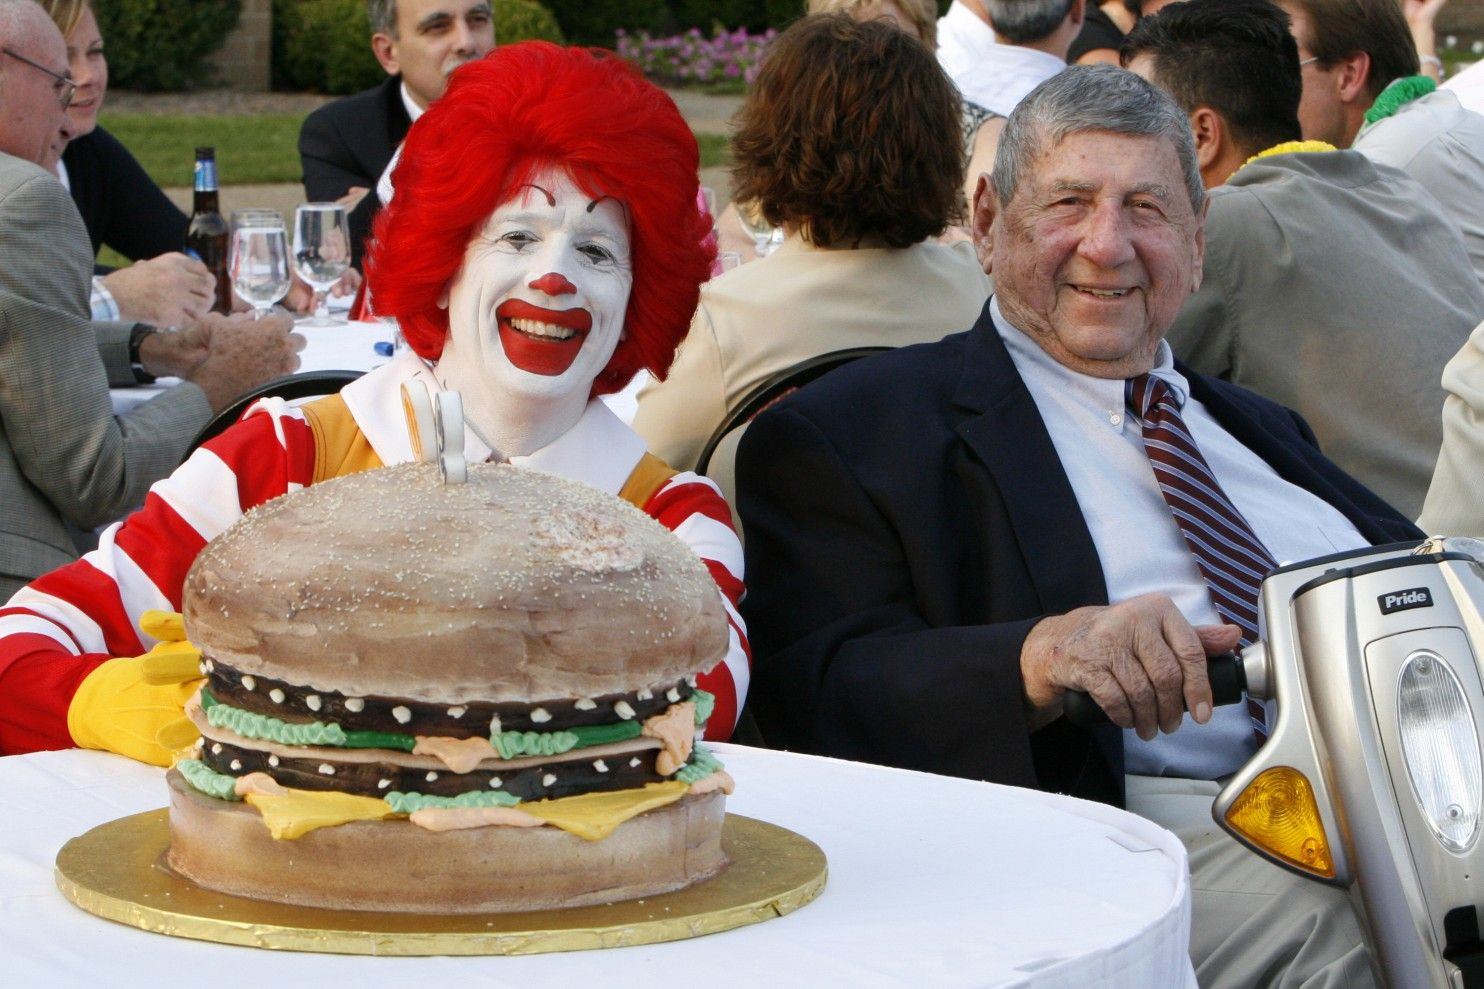 Jim Delligatti who gave the world the Big Mac sandwich dies at 98 - Washington Post